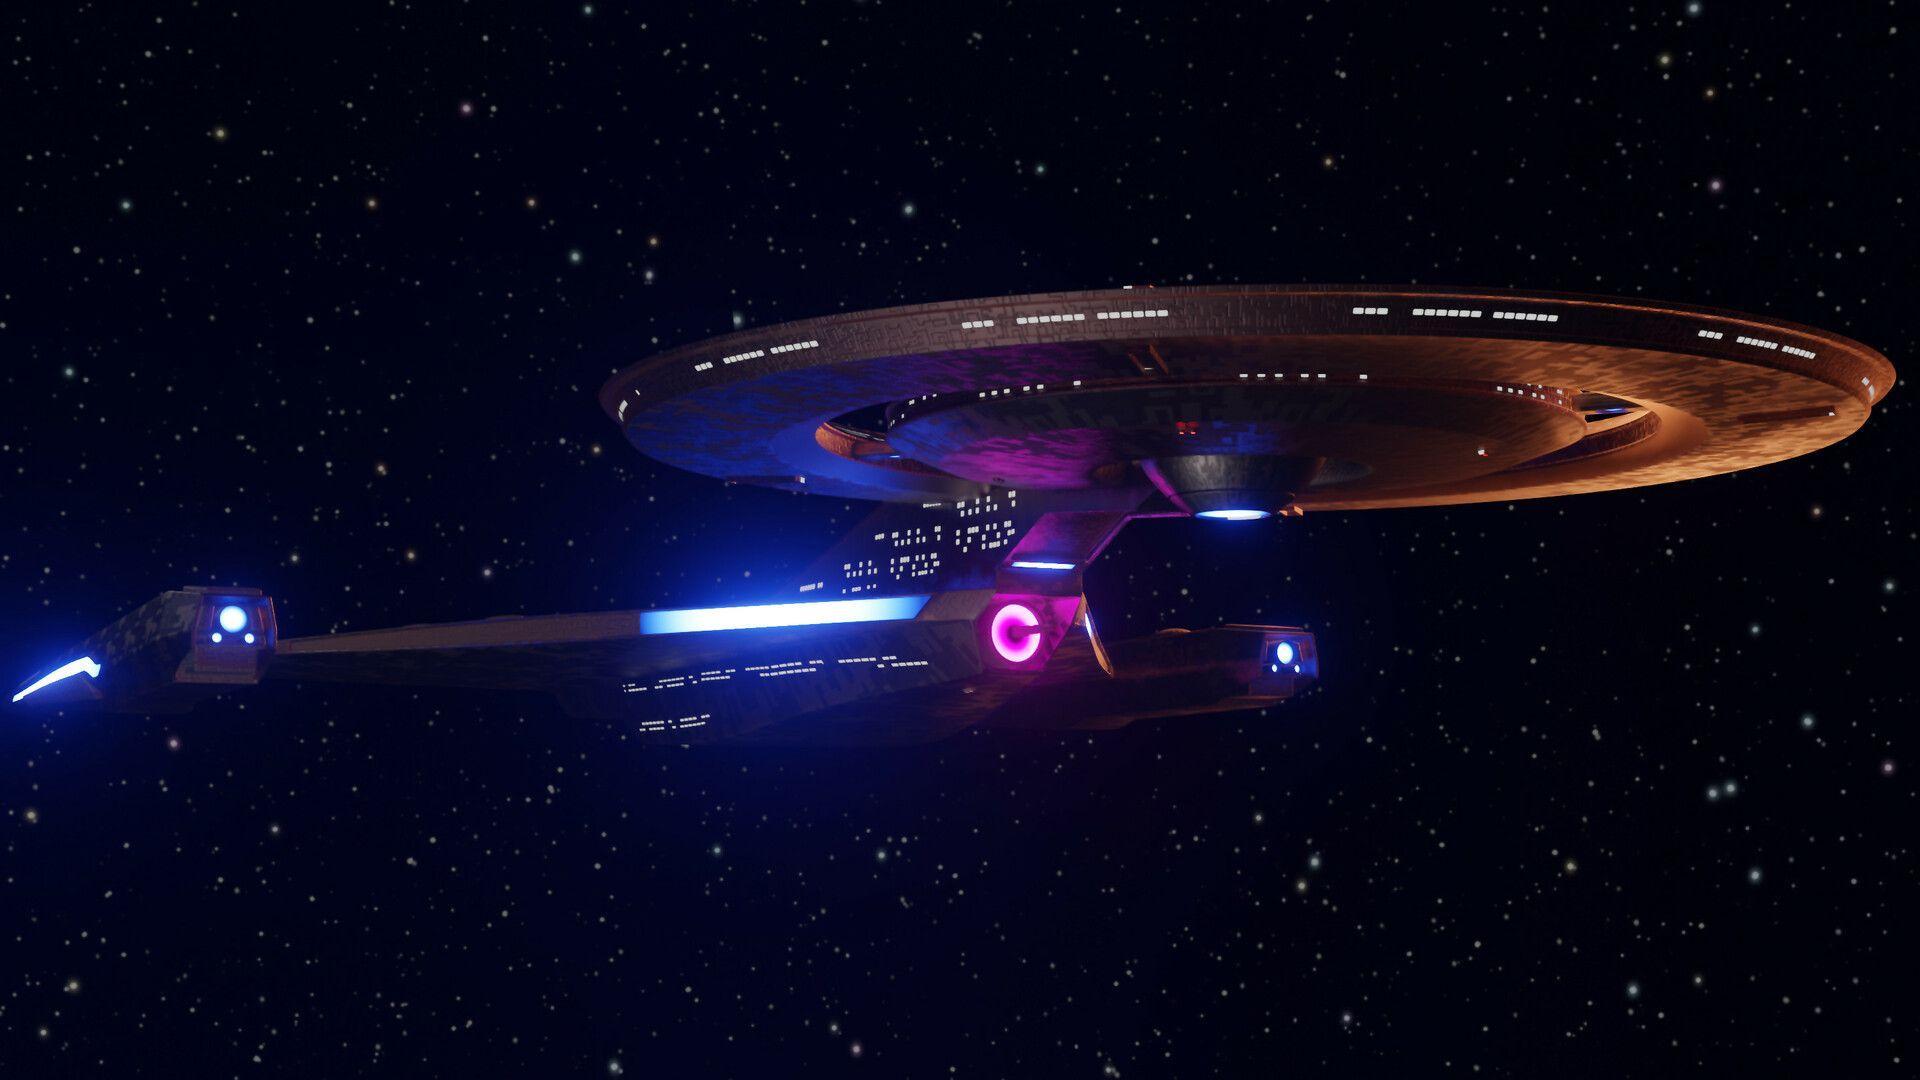 Star Trek Discovery Wallpapers - Top Free Star Trek ...